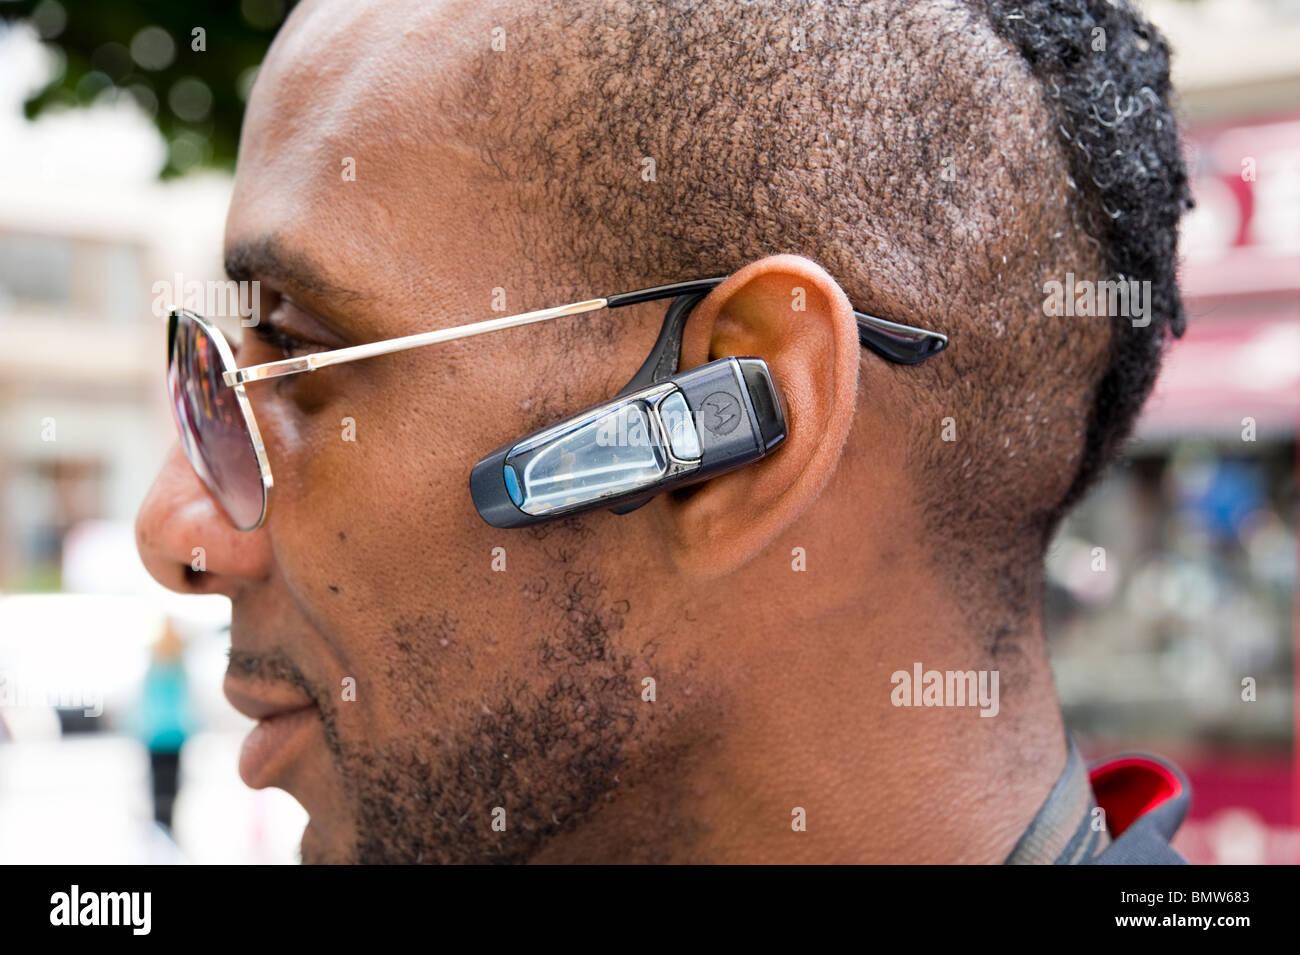 Bluetooth mobile phone headset, London, England, Britain, UK - Stock Image